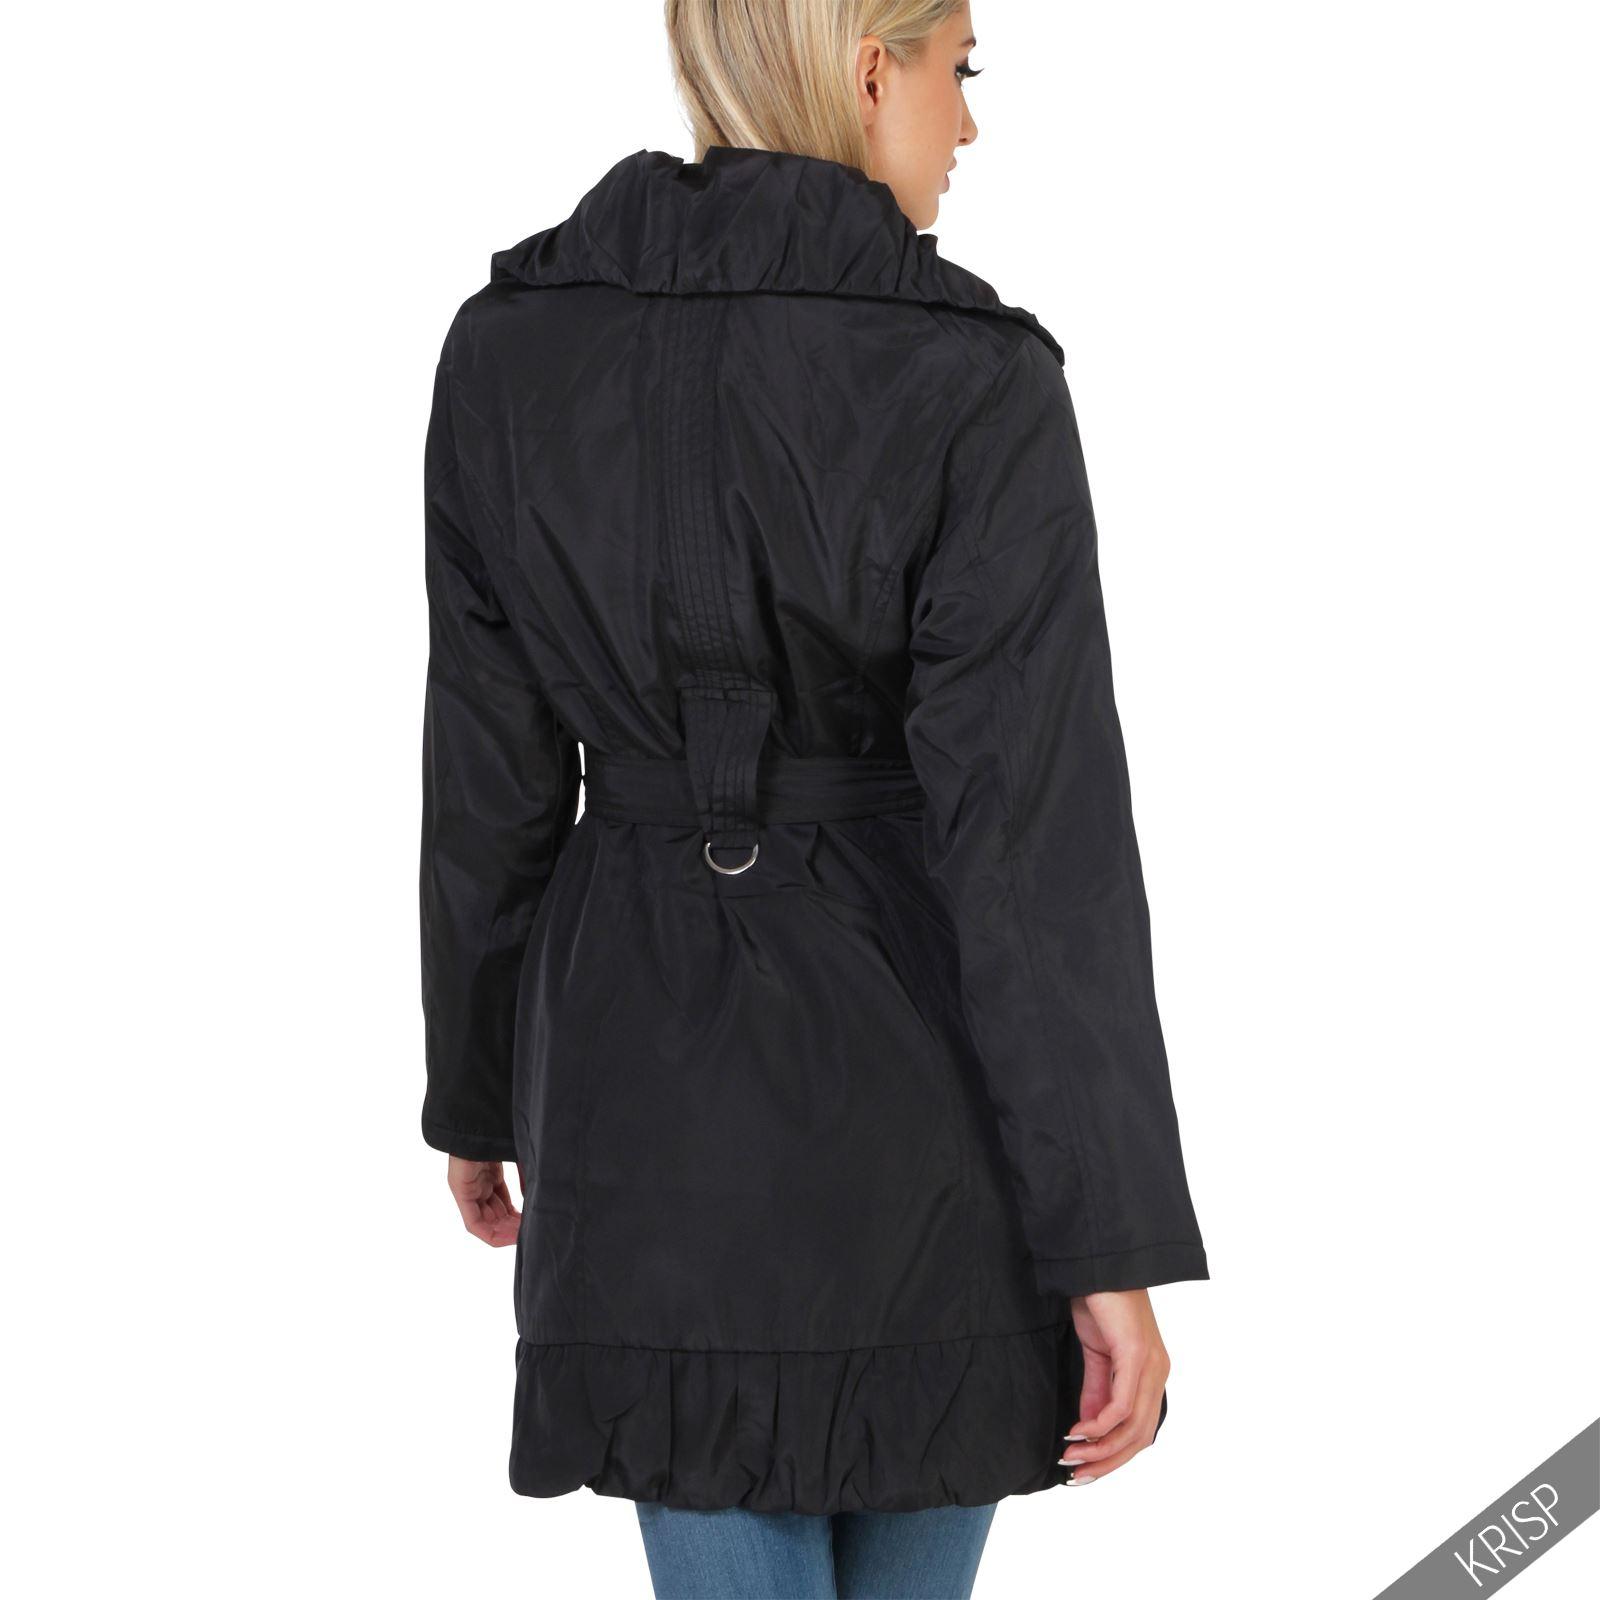 damen parka winter mantel jacke warmes karo fleece. Black Bedroom Furniture Sets. Home Design Ideas